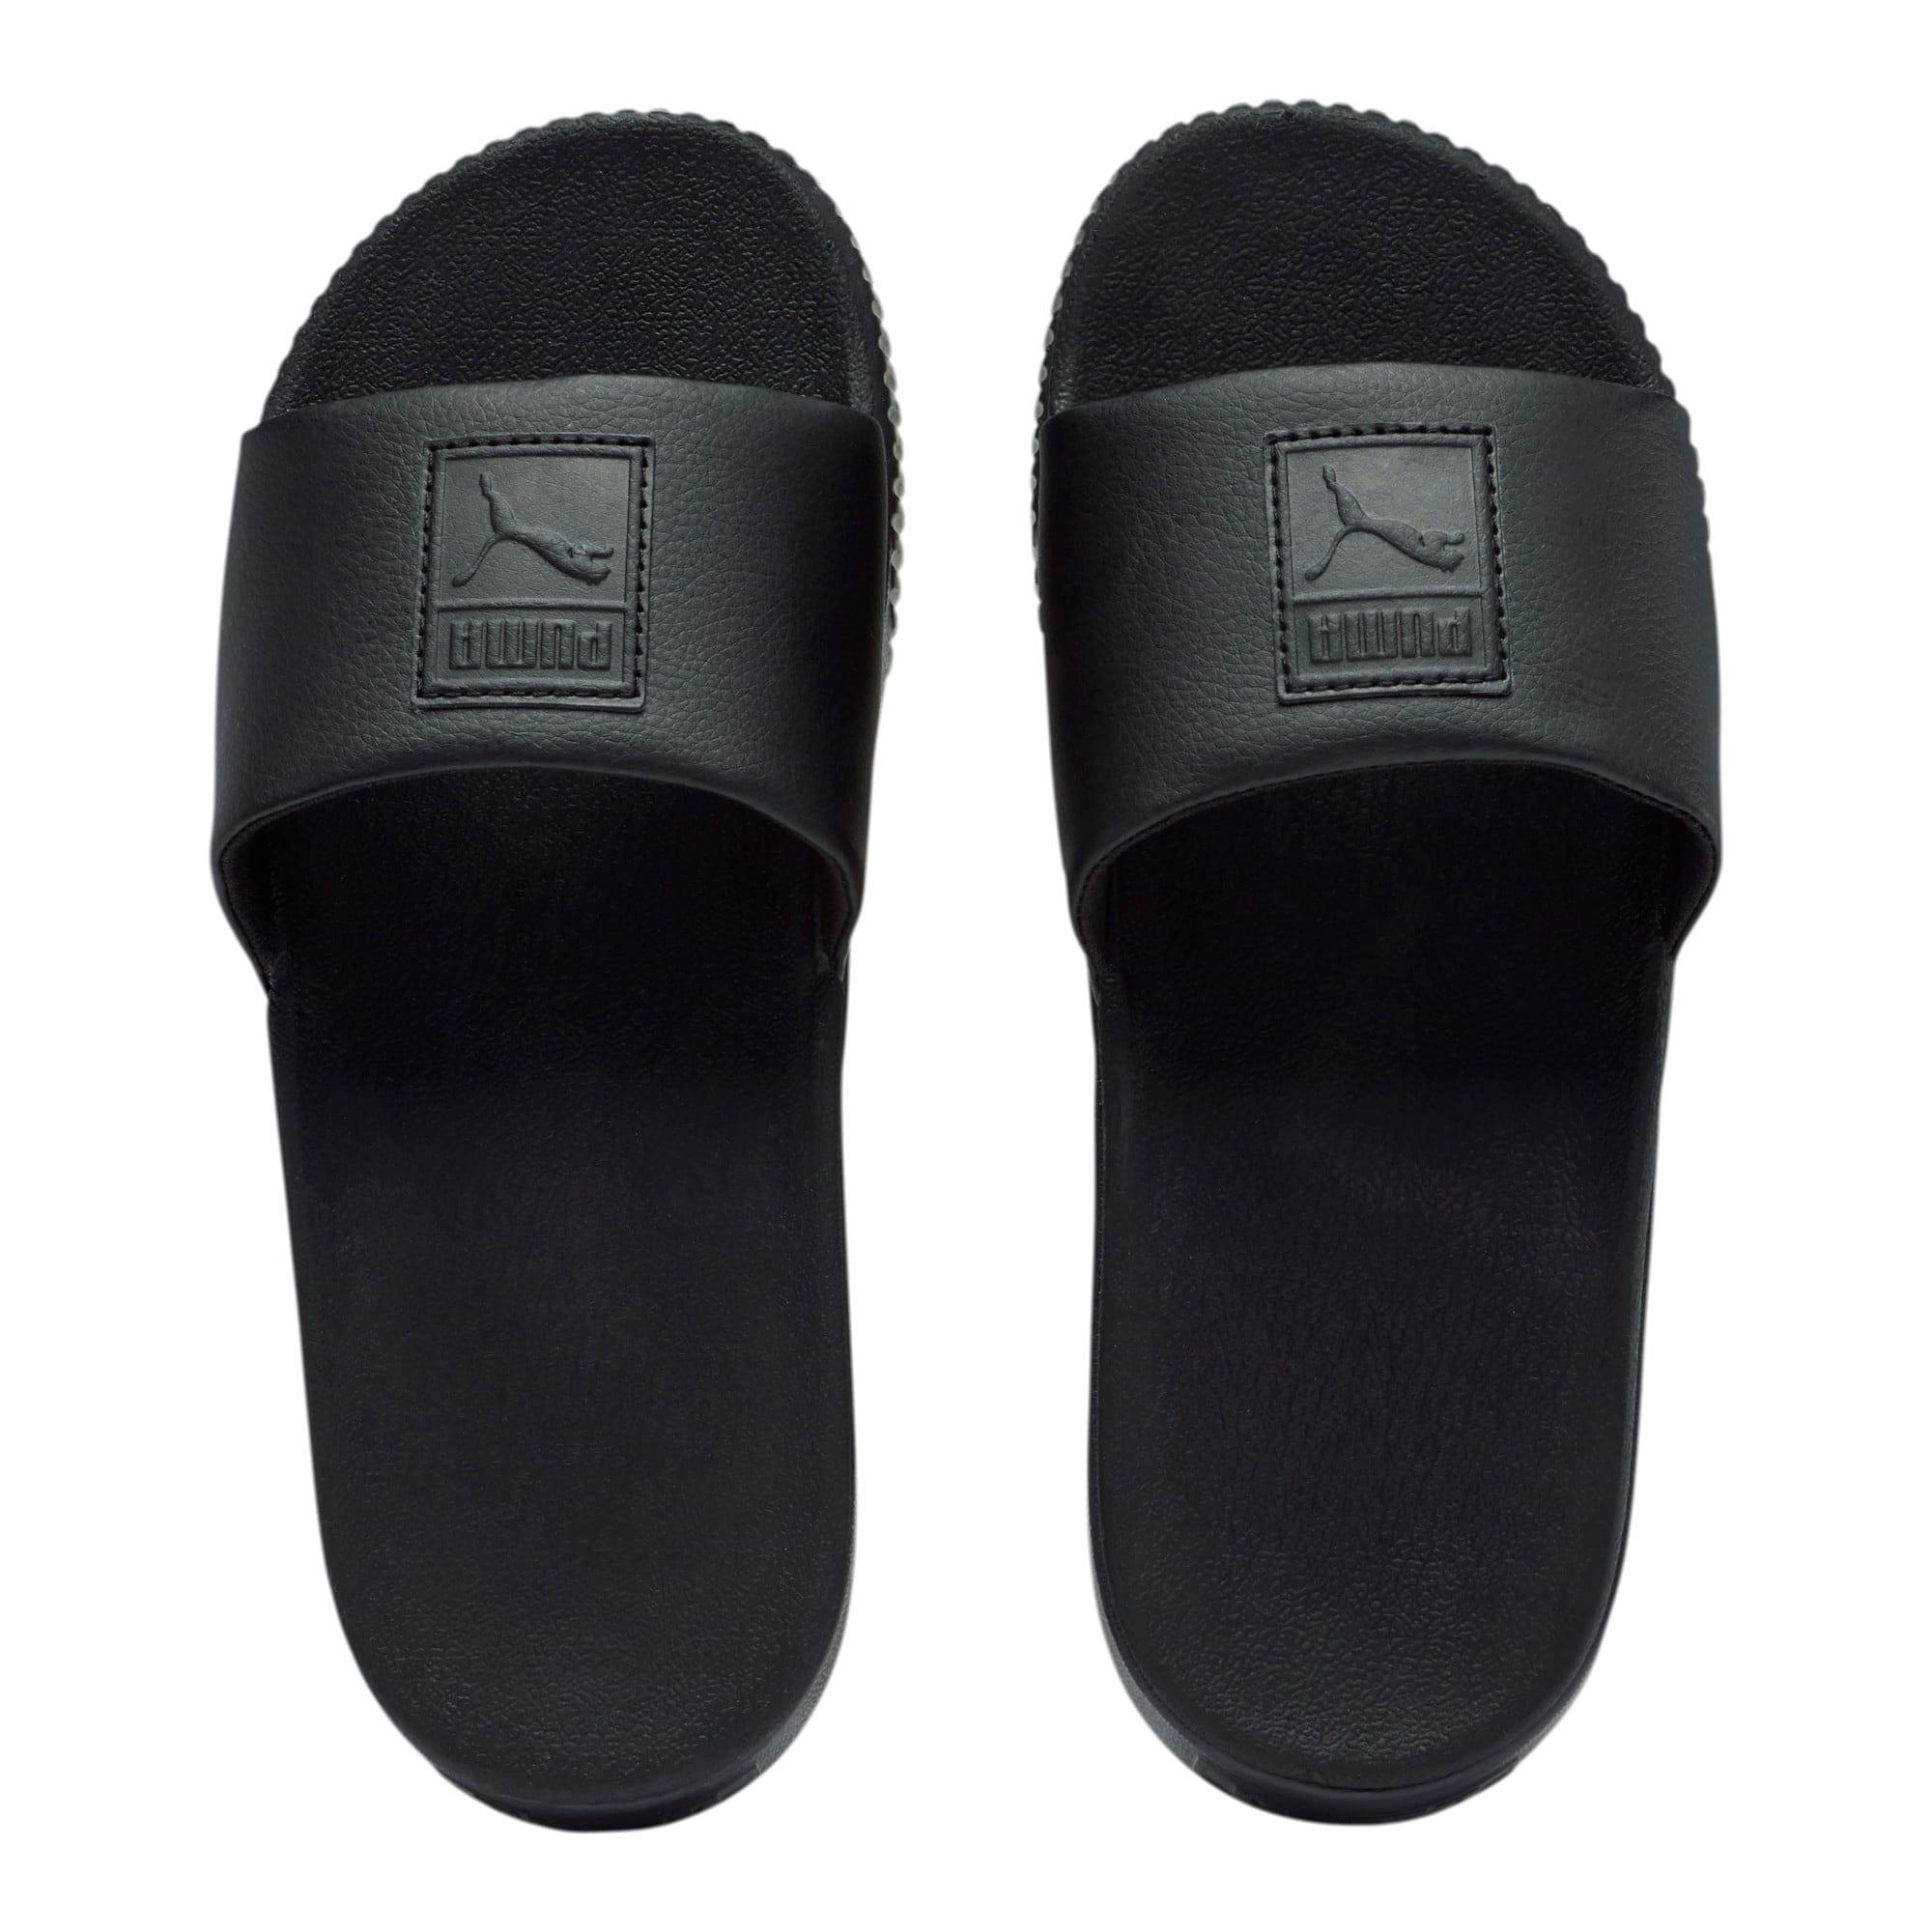 Thumbnail 6 of Platform Slide Women's Sandals, Puma Black-Puma Black, medium